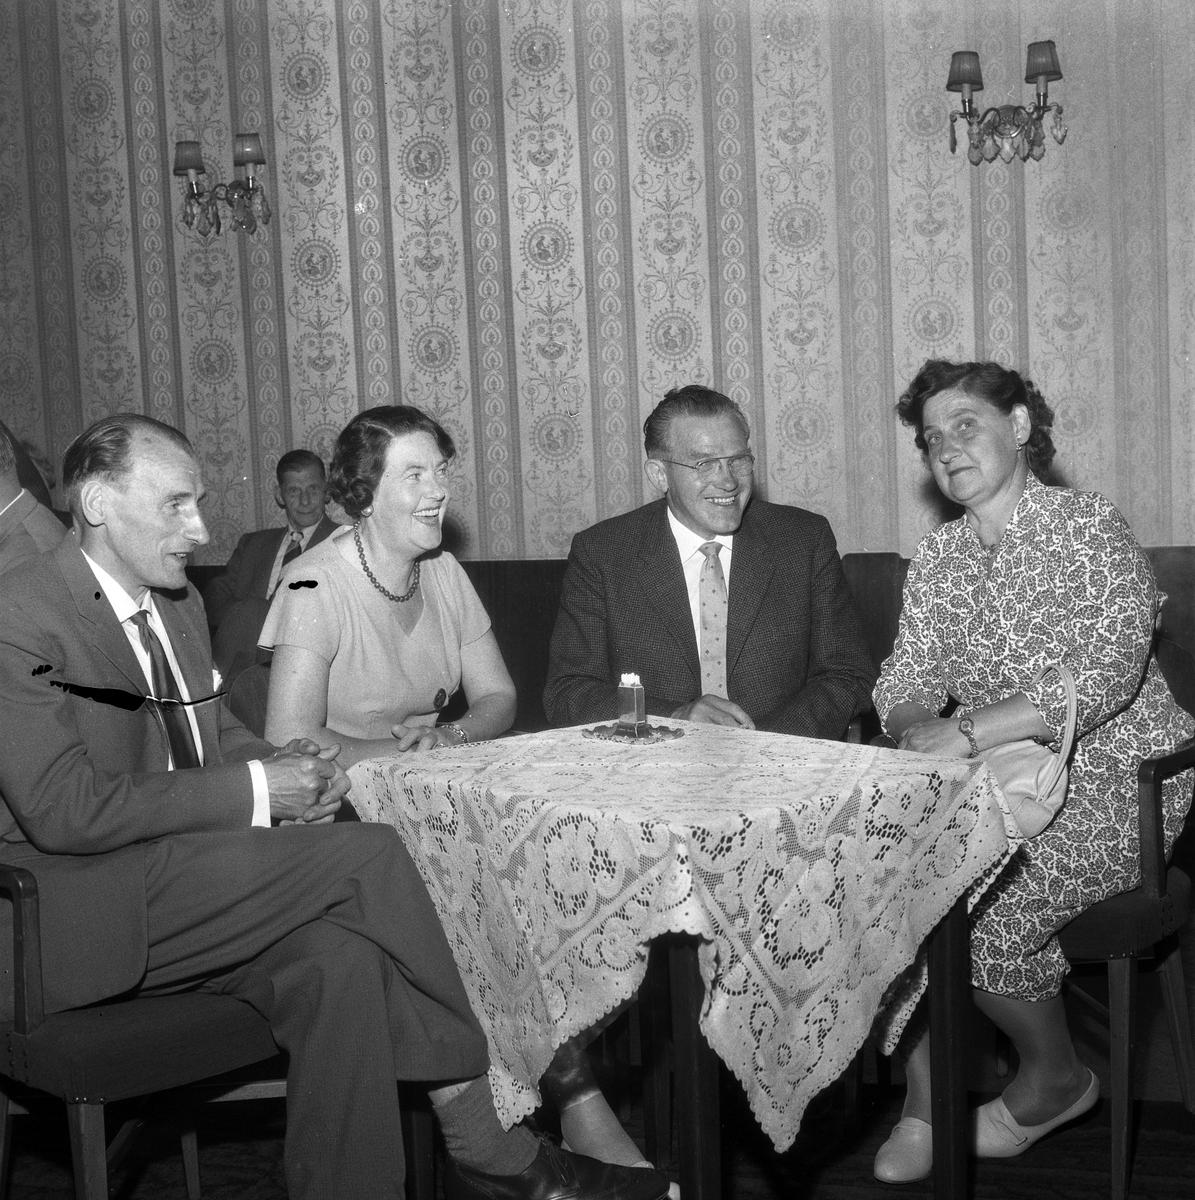 Skomakarmästare på Örebromöte.  13 juli 1959.